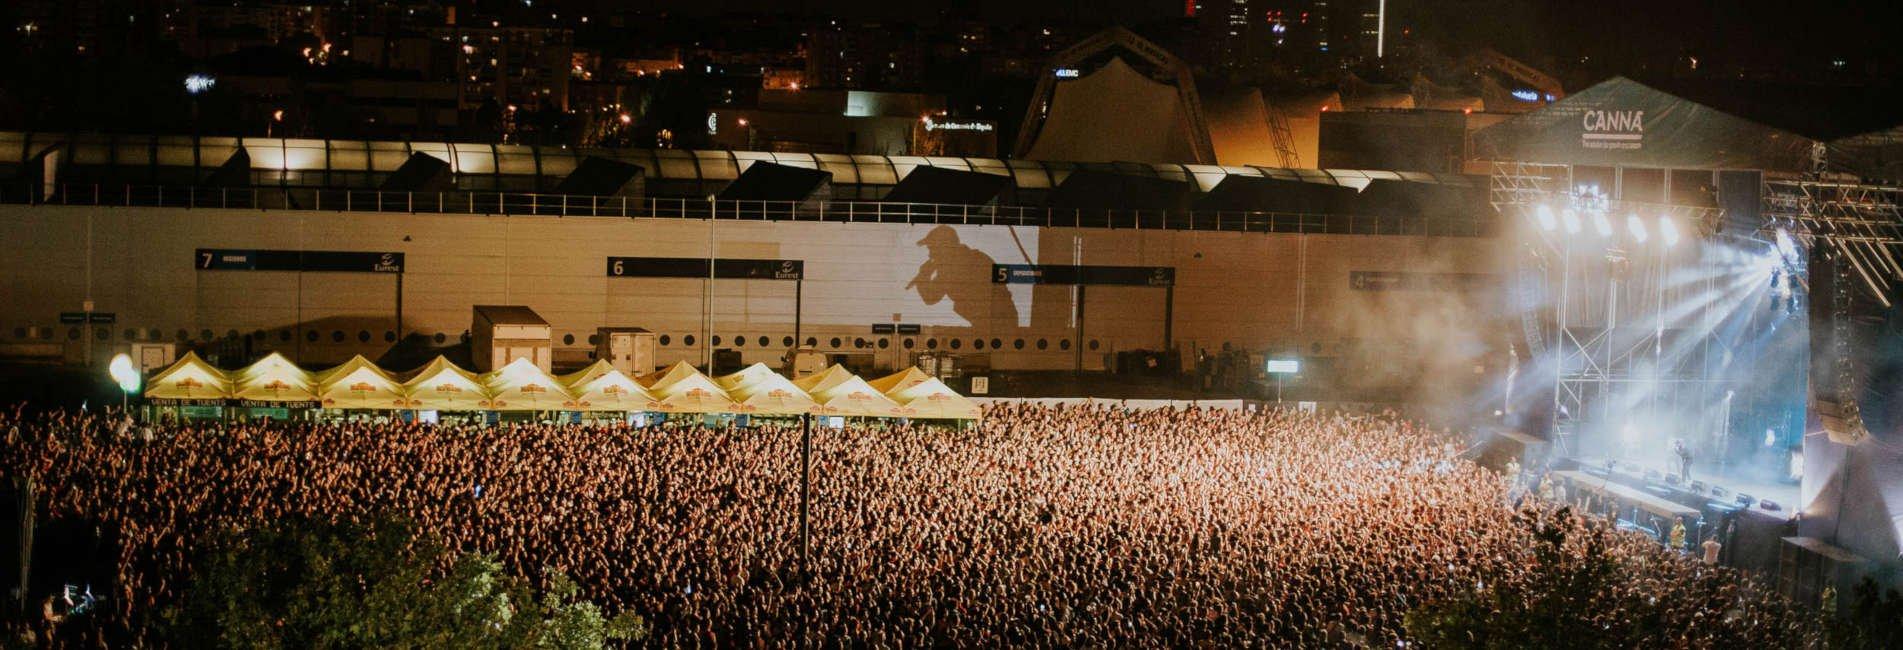 Festival Madrid Salvaje 2019 en Ifema - Feria de Madrid